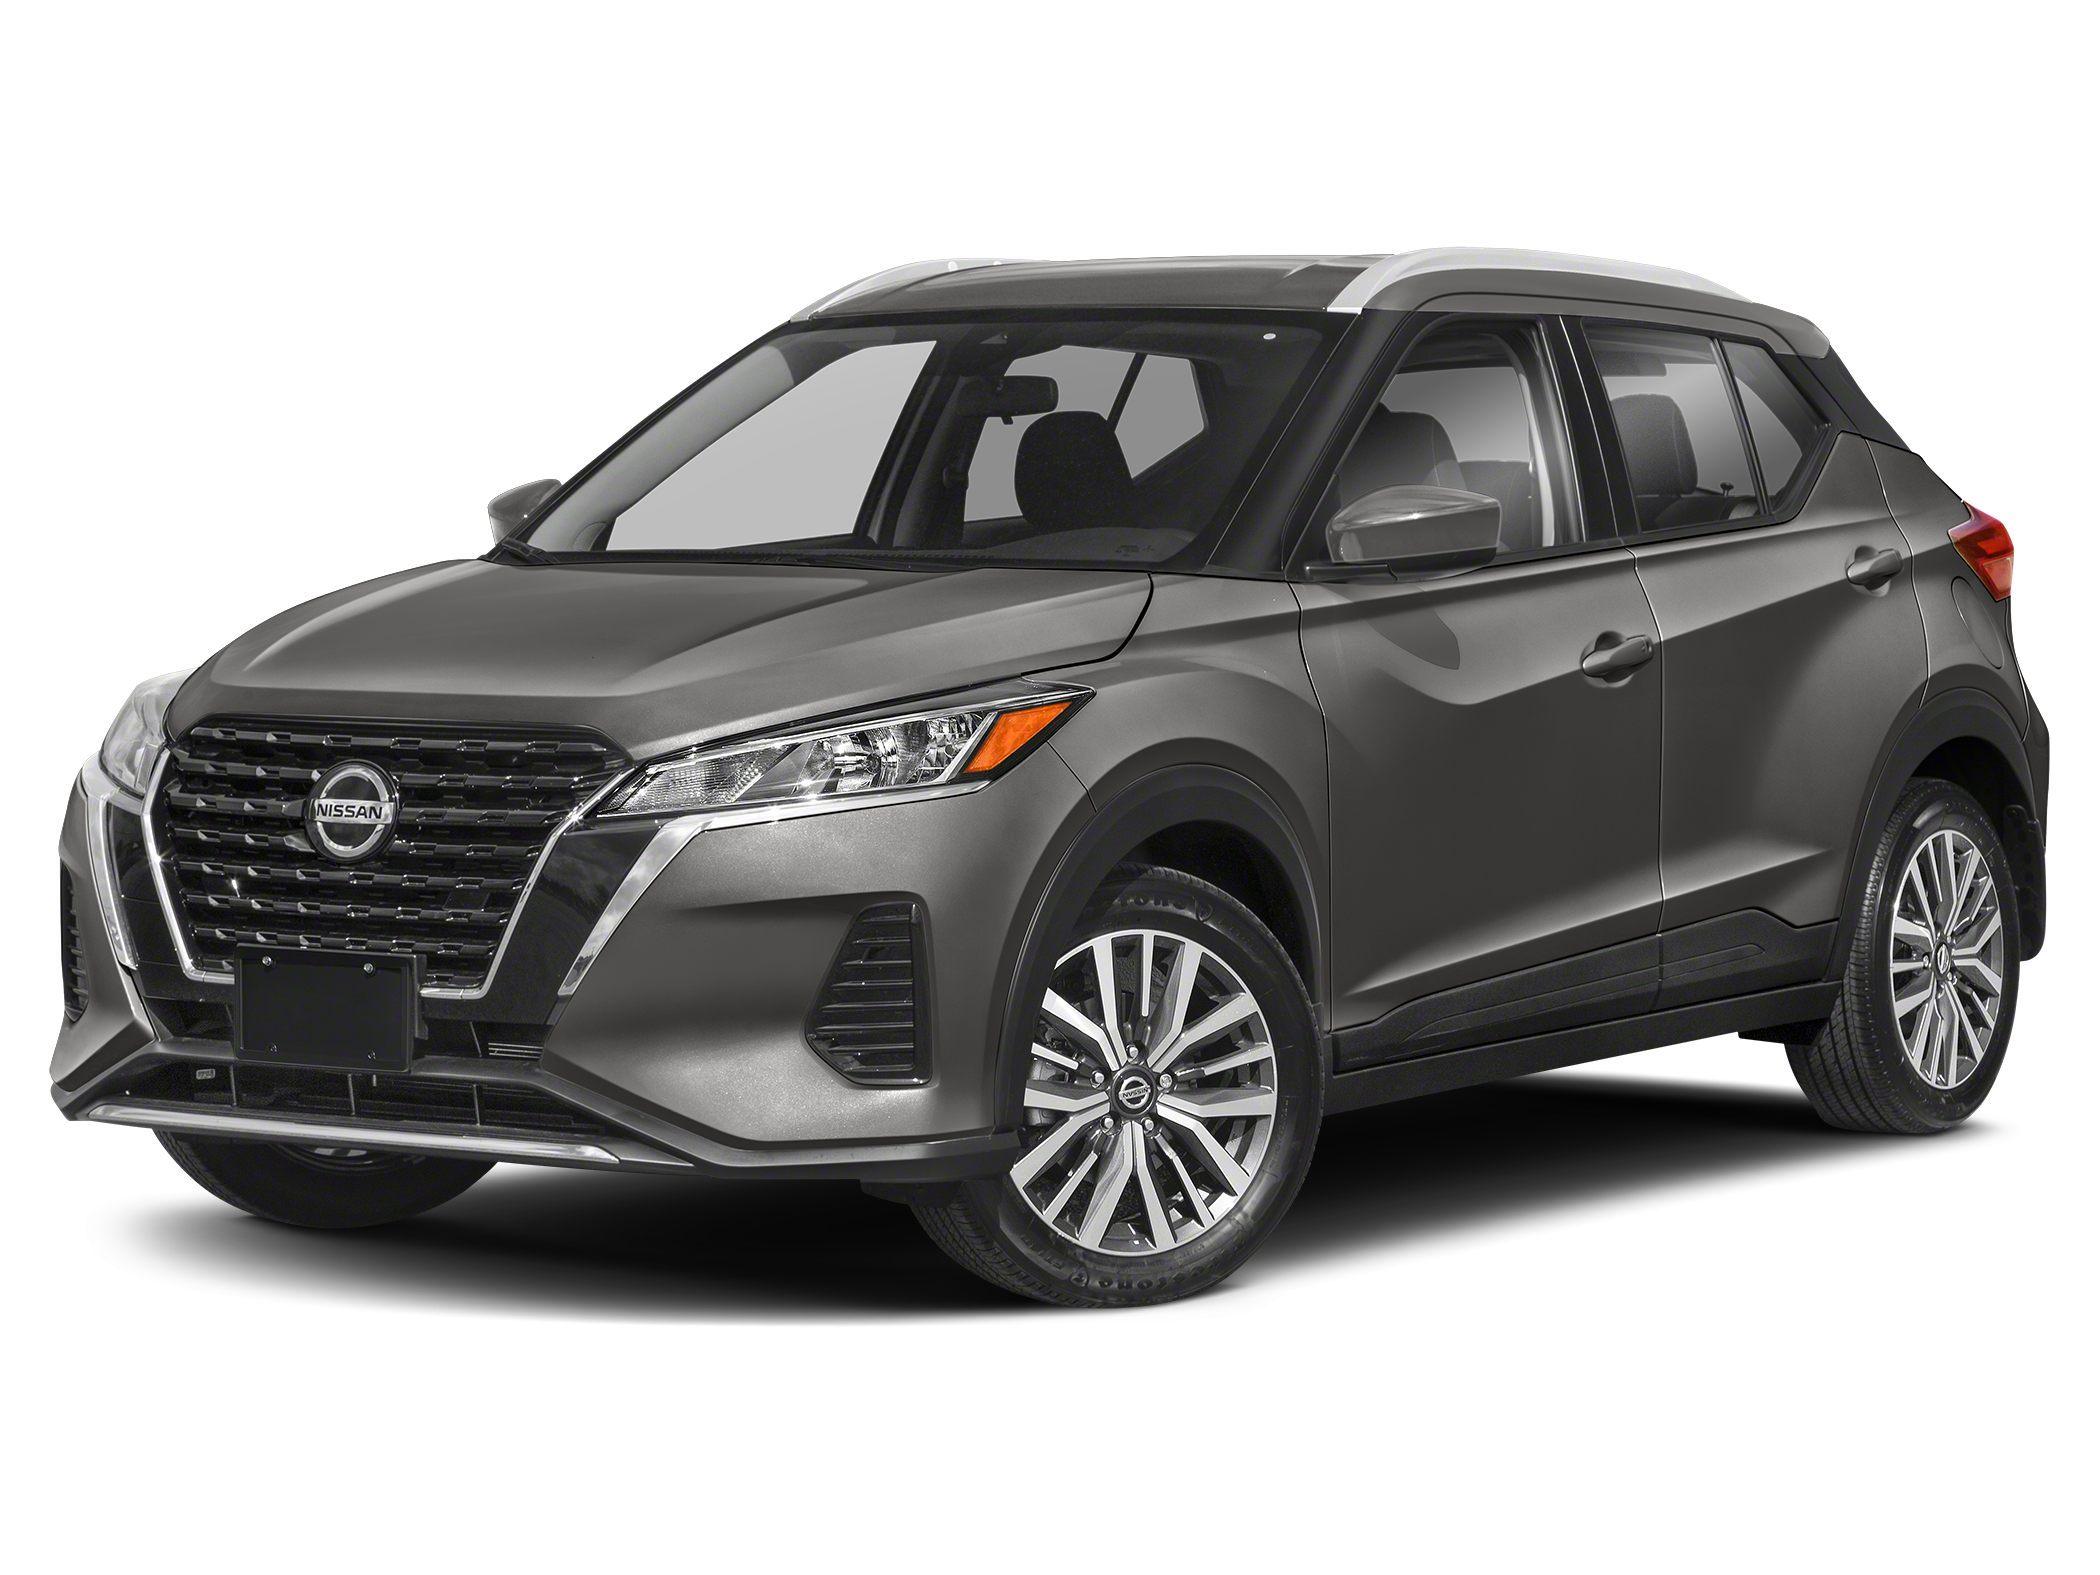 2021 Nissan Kicks SUV